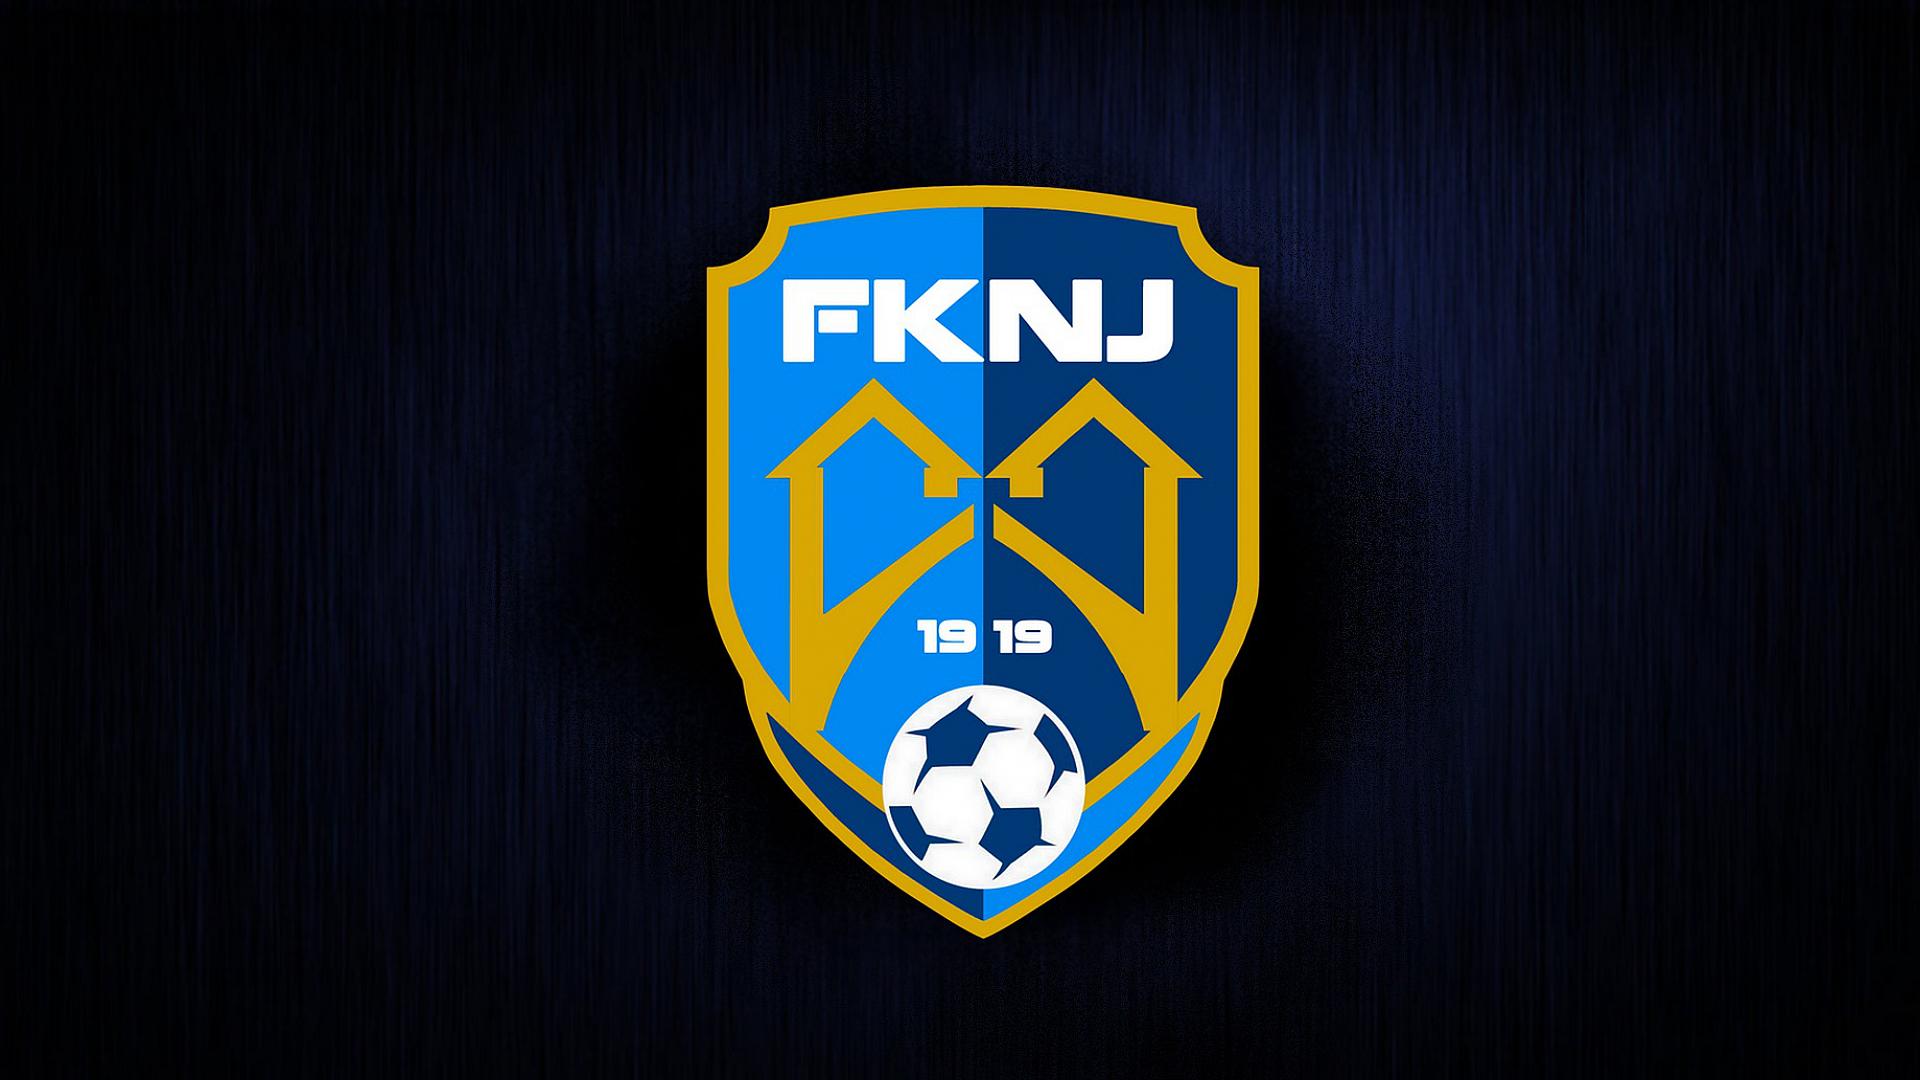 FKNJ - Fotbal Nový Jičín, znak barevný